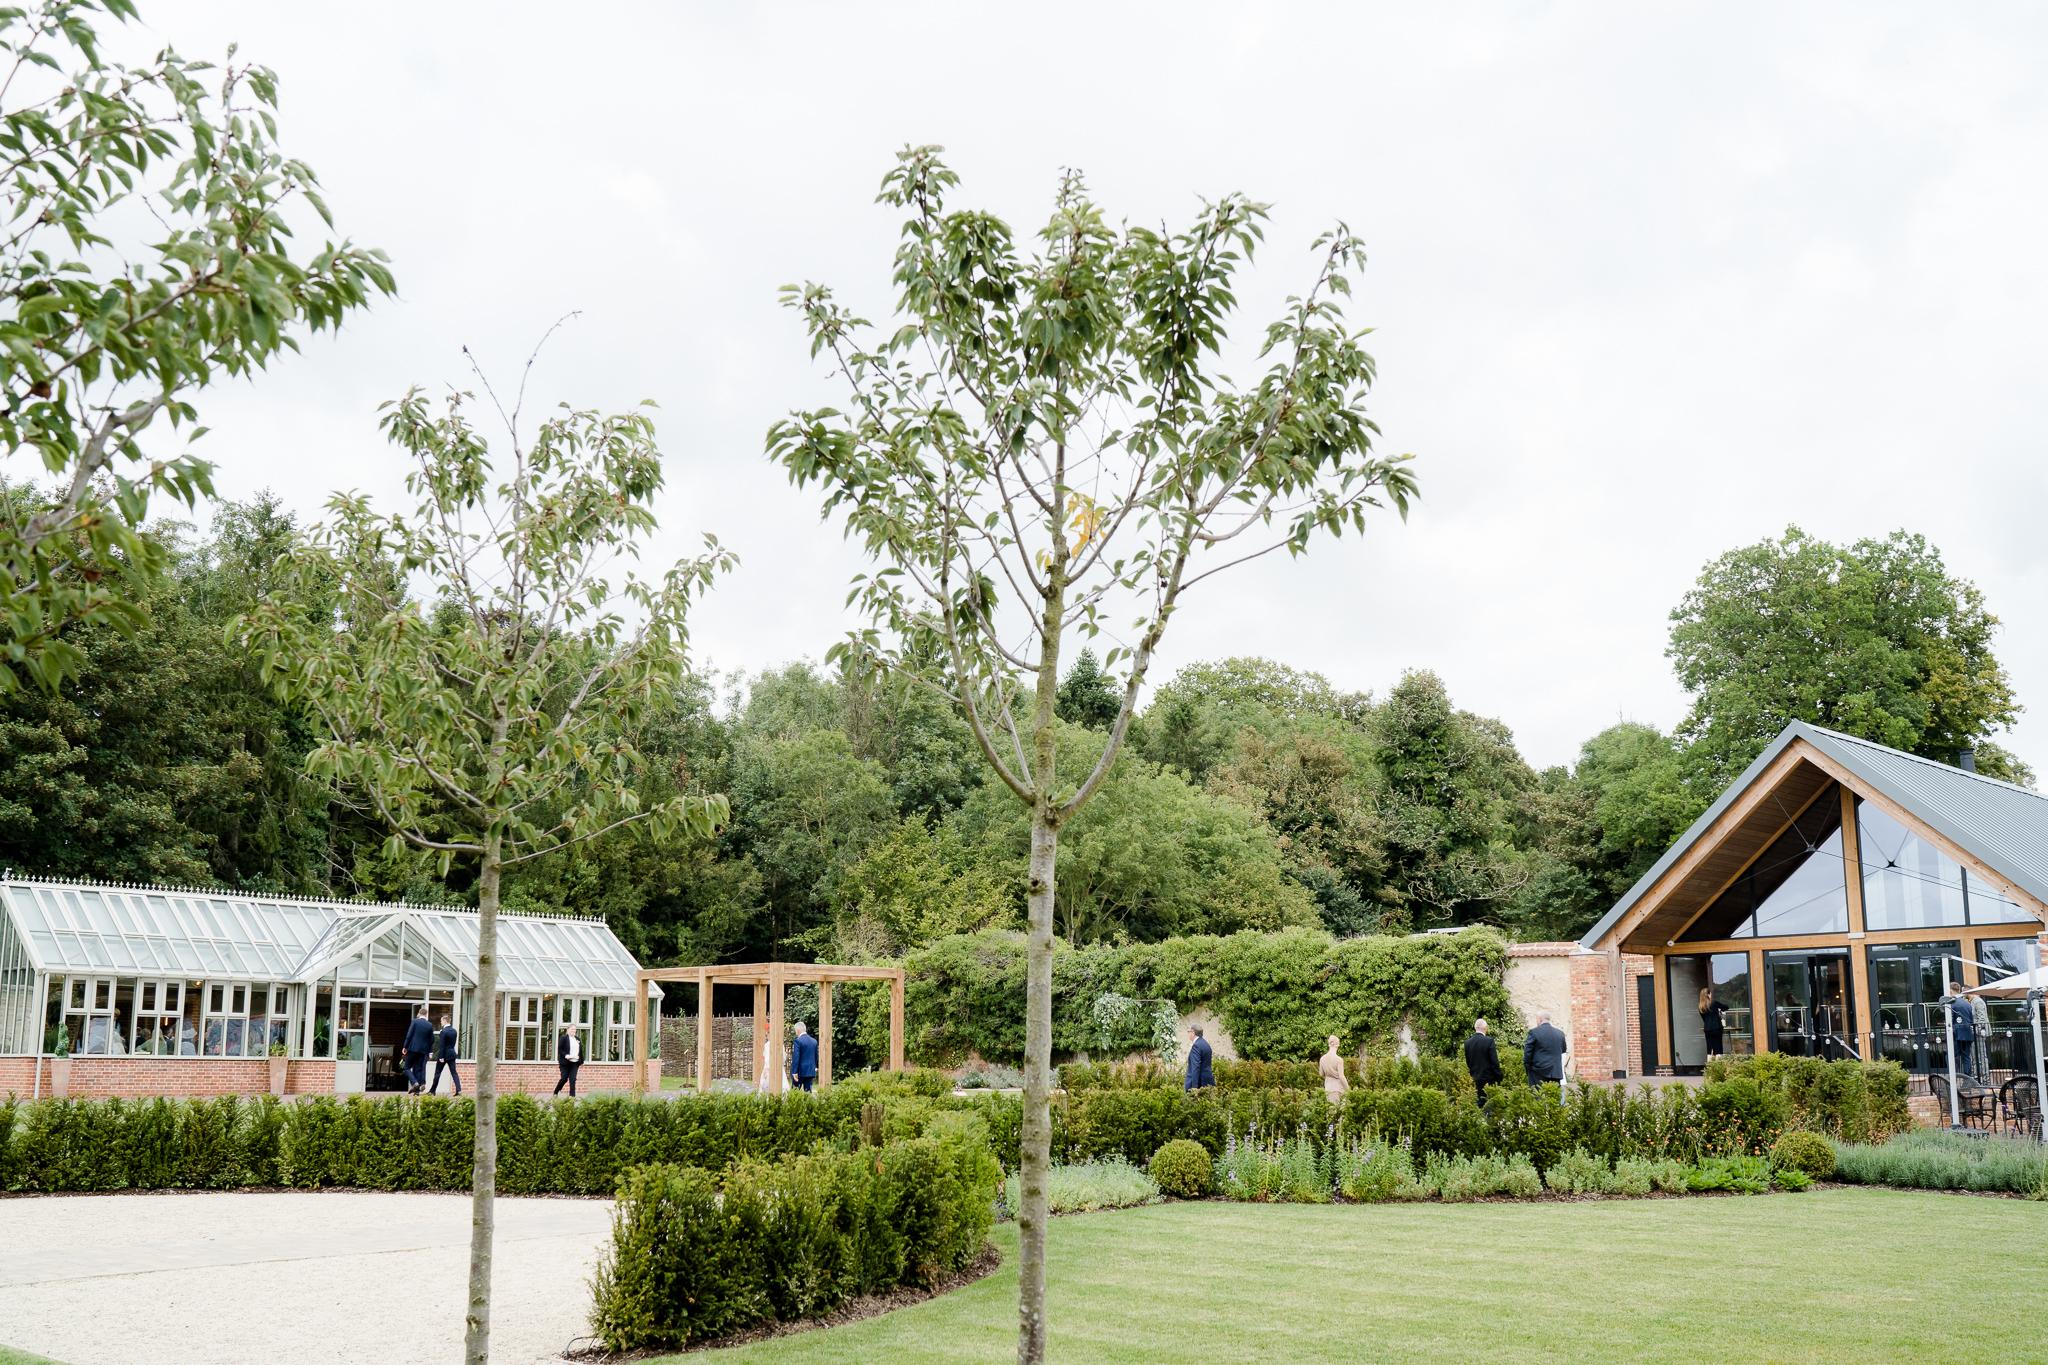 Gardens at Syrencot House wedding venue Wiltshire